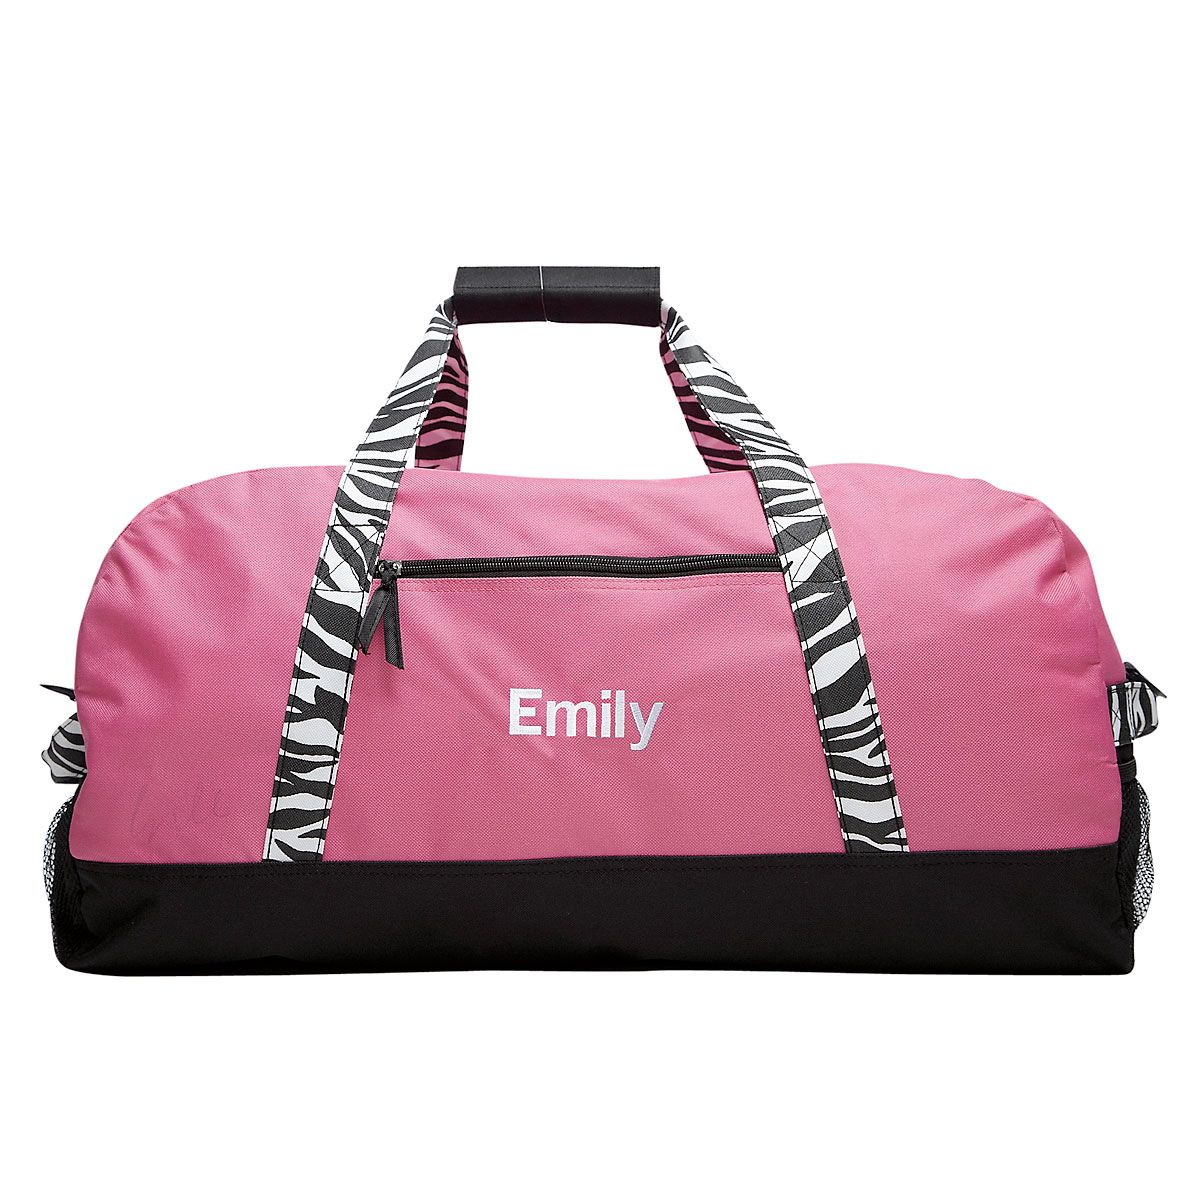 "Zebra Print Personalized 30"" Duffel Bag"